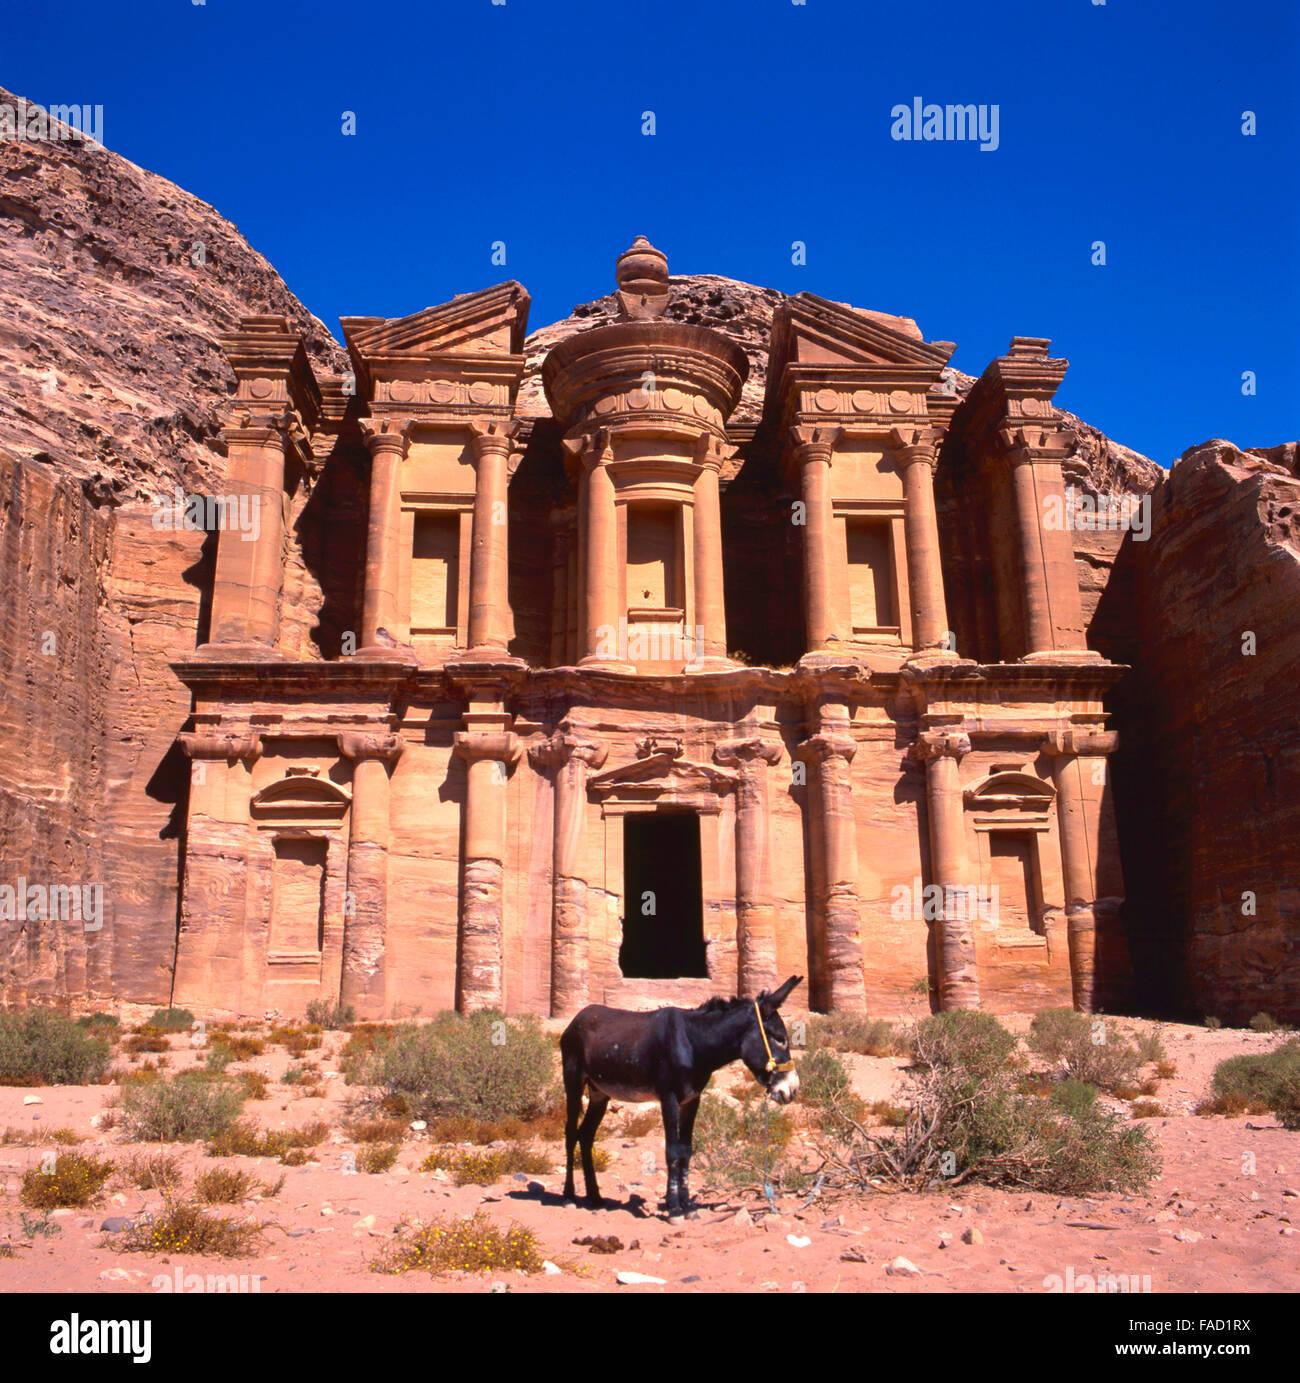 Das Ed-Deir-Grab in Petra.The alte Stadt Petra ist ein UNESCO-Weltkulturerbe Stockbild